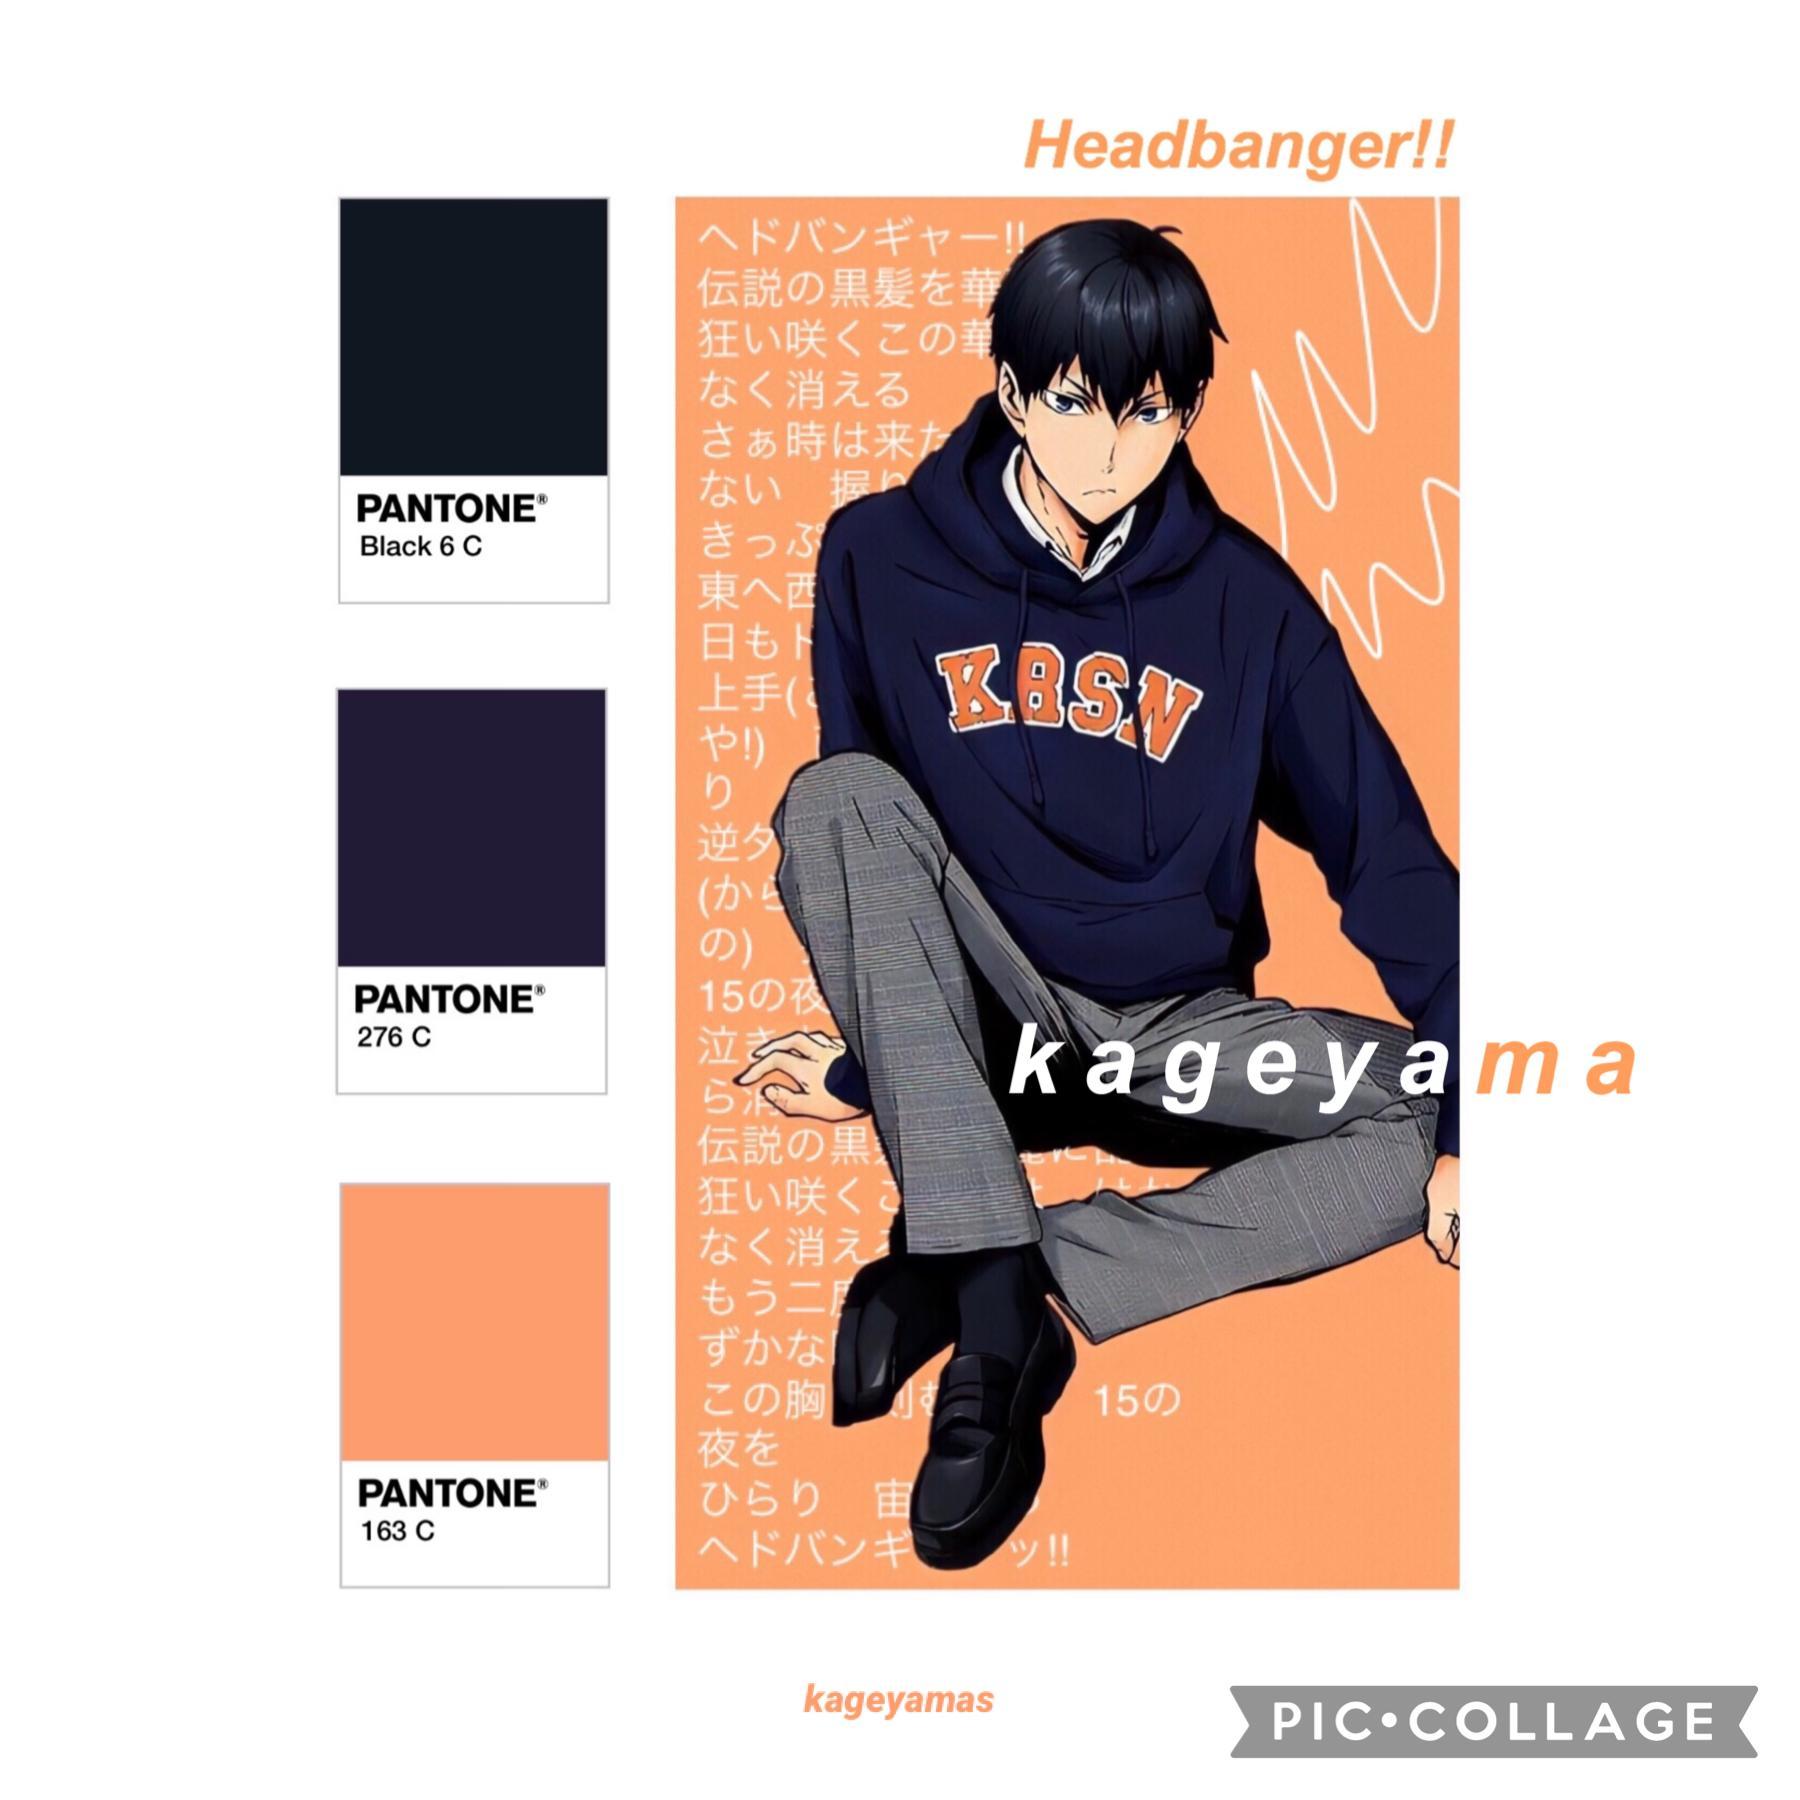 old kageyama palette edit